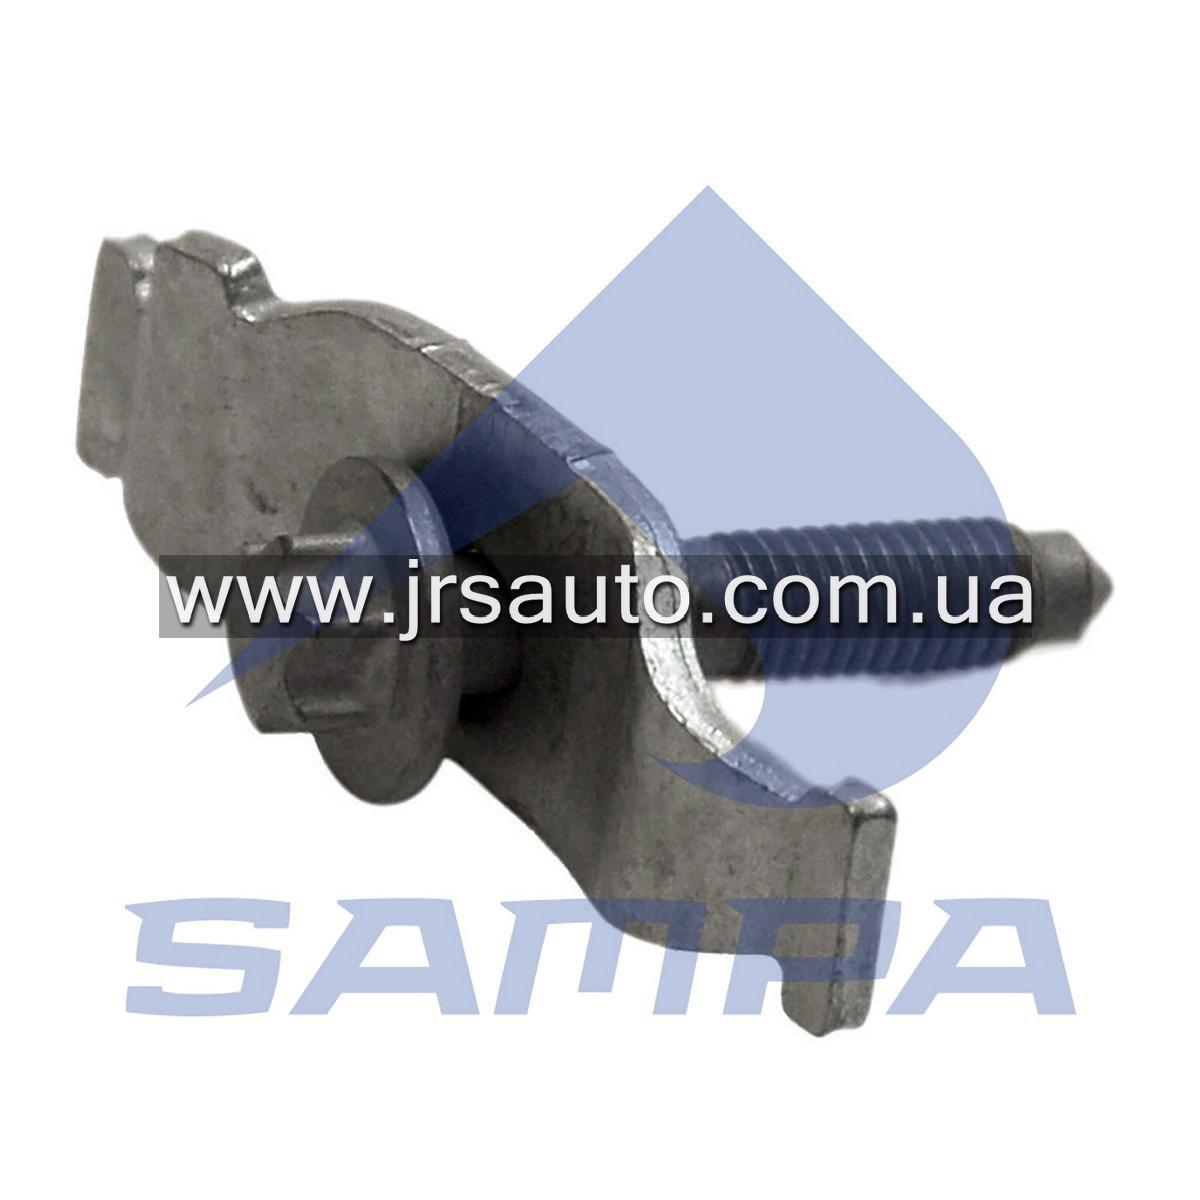 Крепление диска тормозной (болт+пластина) 21x64,5xM8x1,25/40 DAF CF65/75/85,XF95 \1693978 \ 050.152